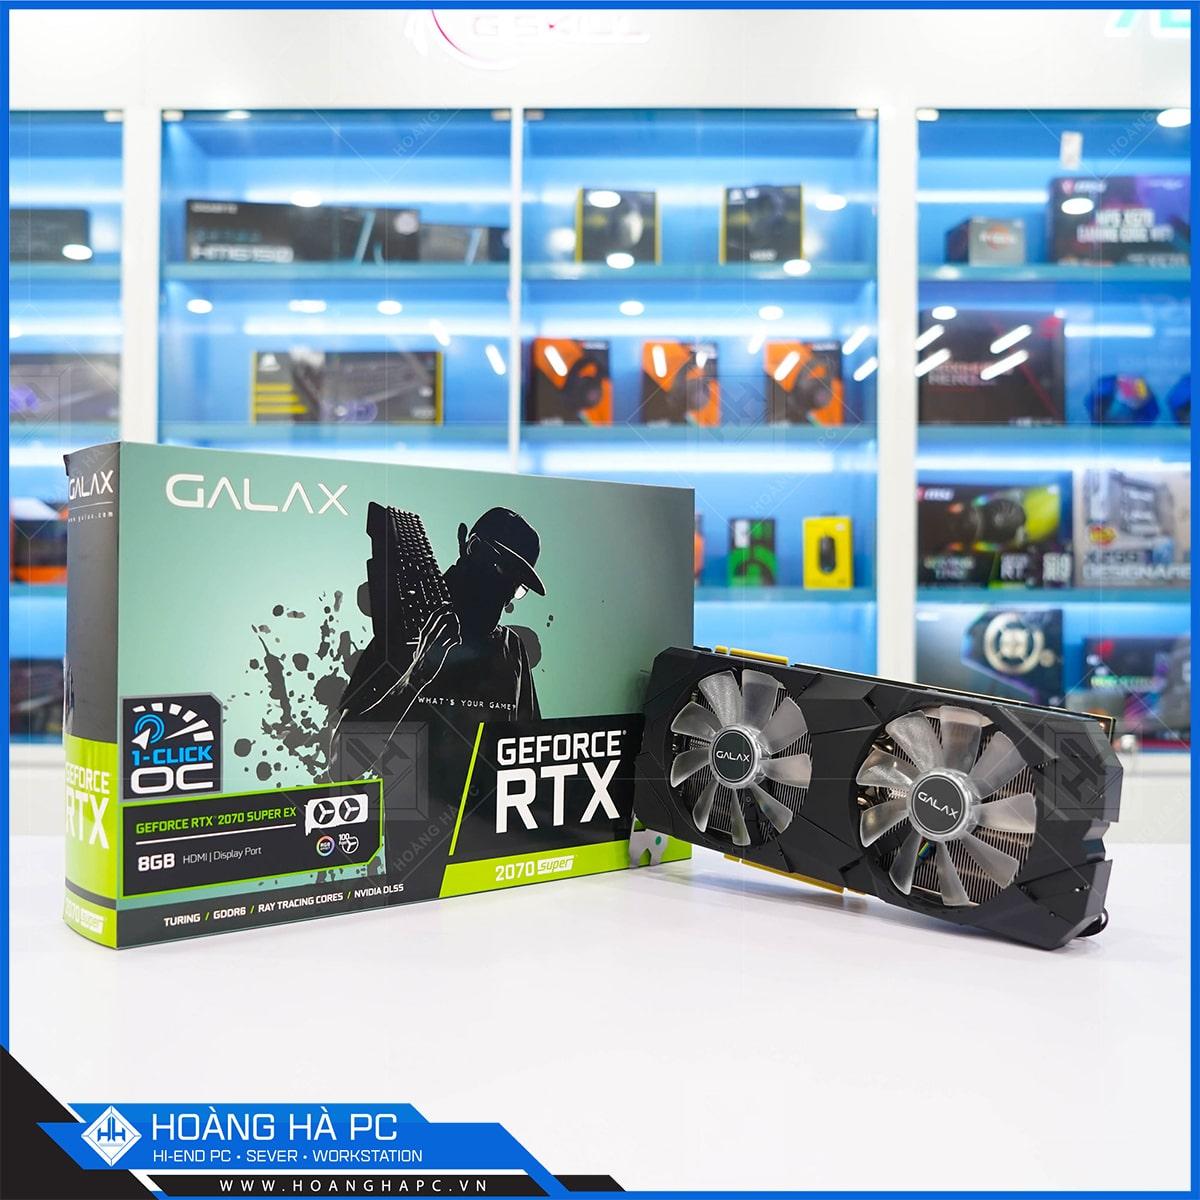 Galax RTX 2070 Super (1 Click OC) 8G Black